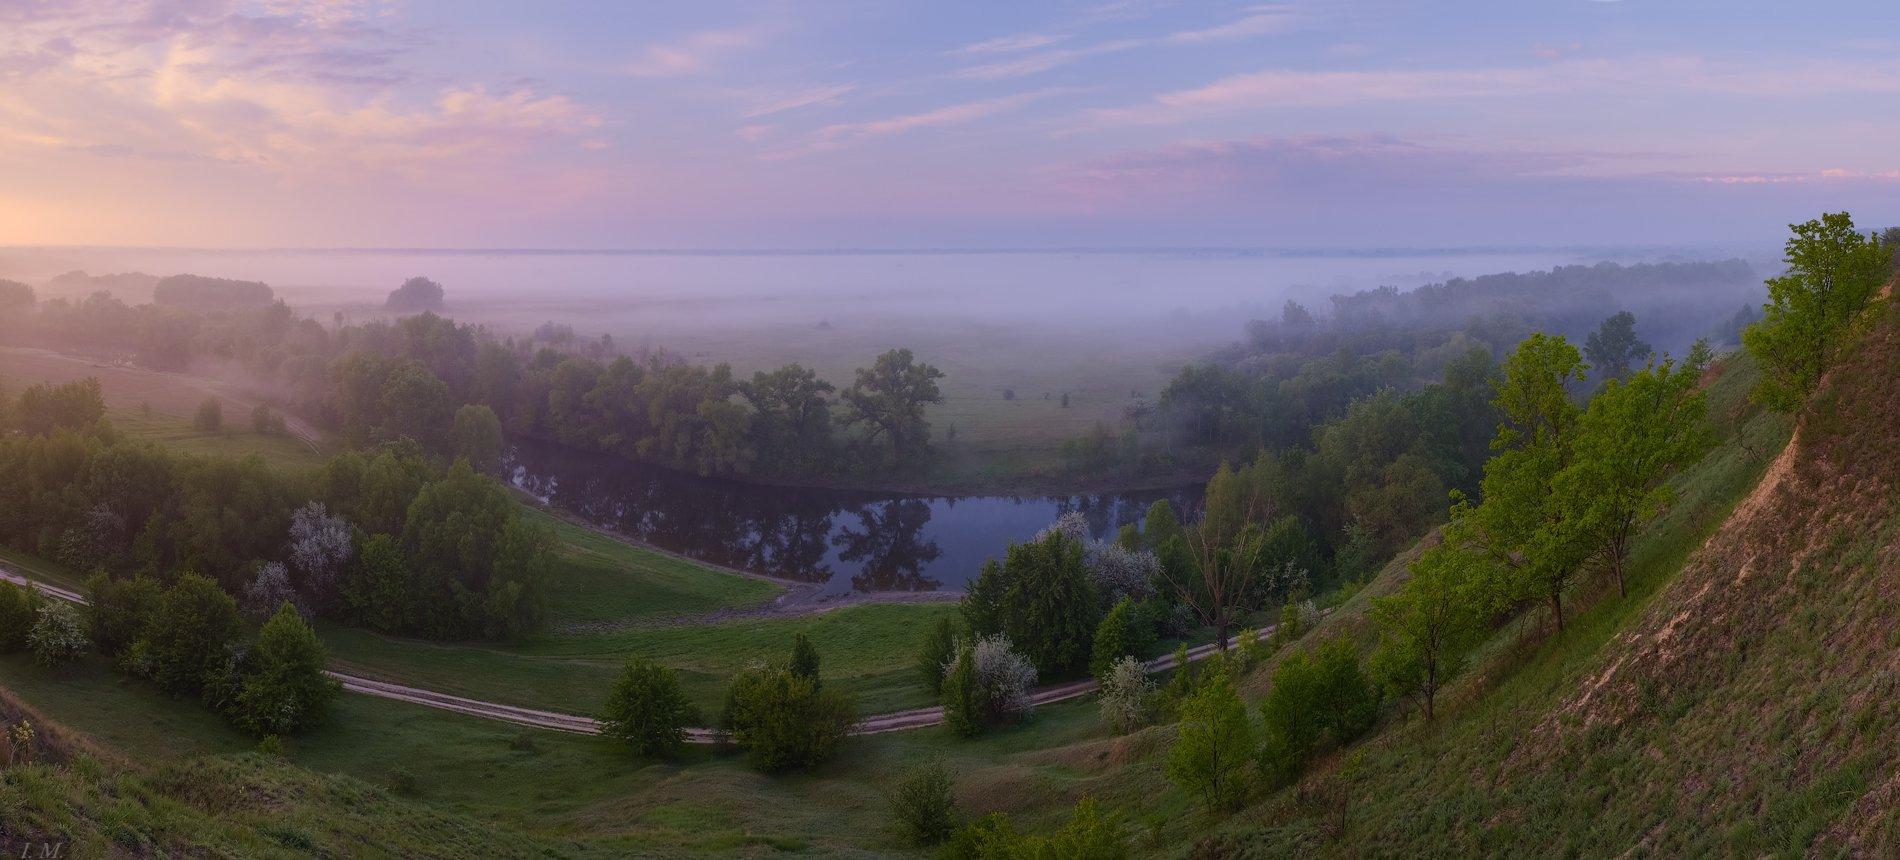 утро, туман, весна, рассвет, май, панорама, холмы, река, псел, spring, morning, fog, river, psel, panorama, I'M